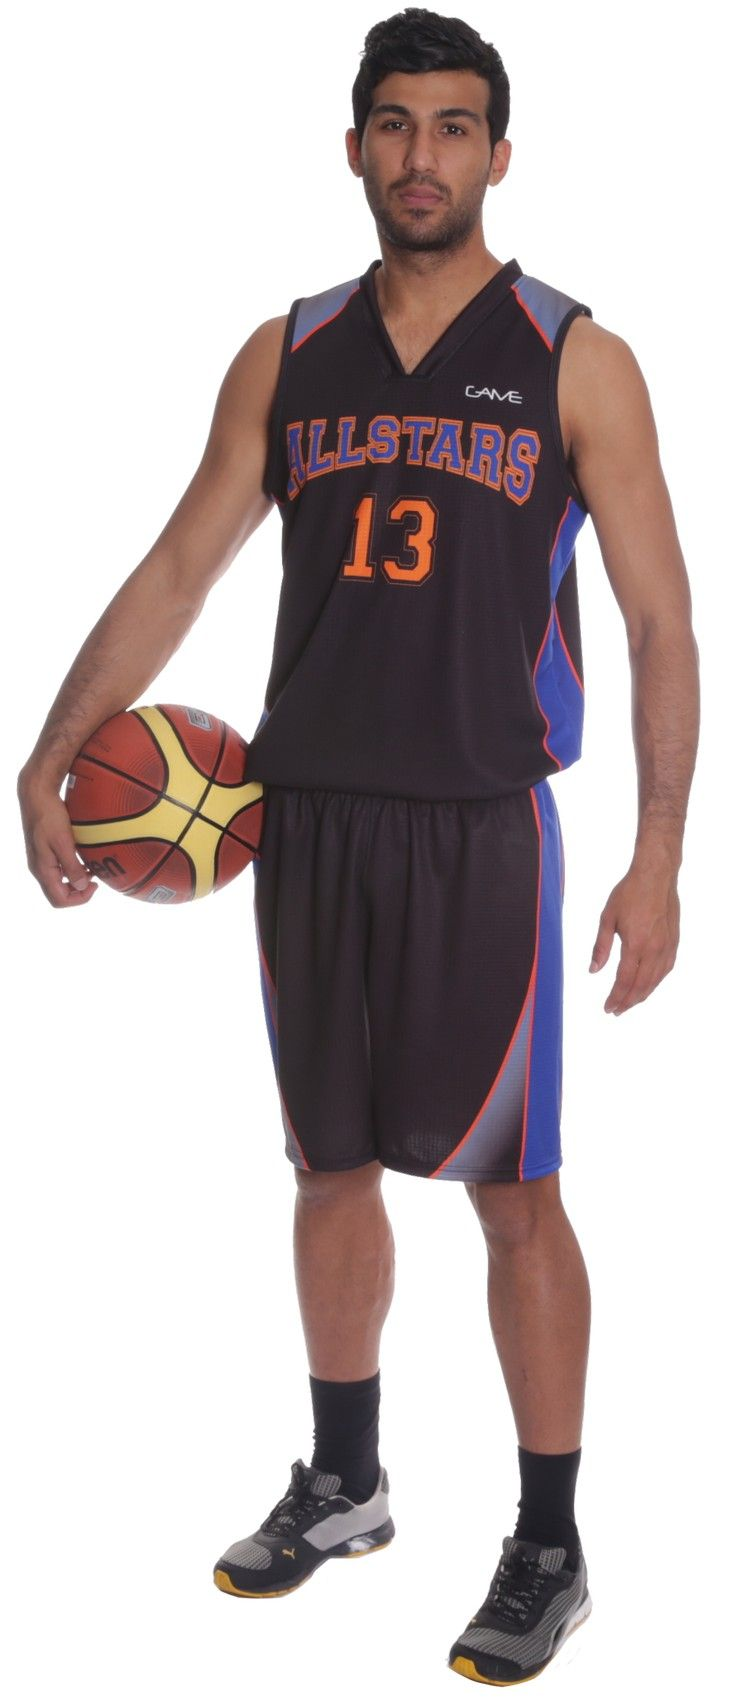 Basketball Uniforms | #Basketball #BasketballUniforms #BasketballJerseys